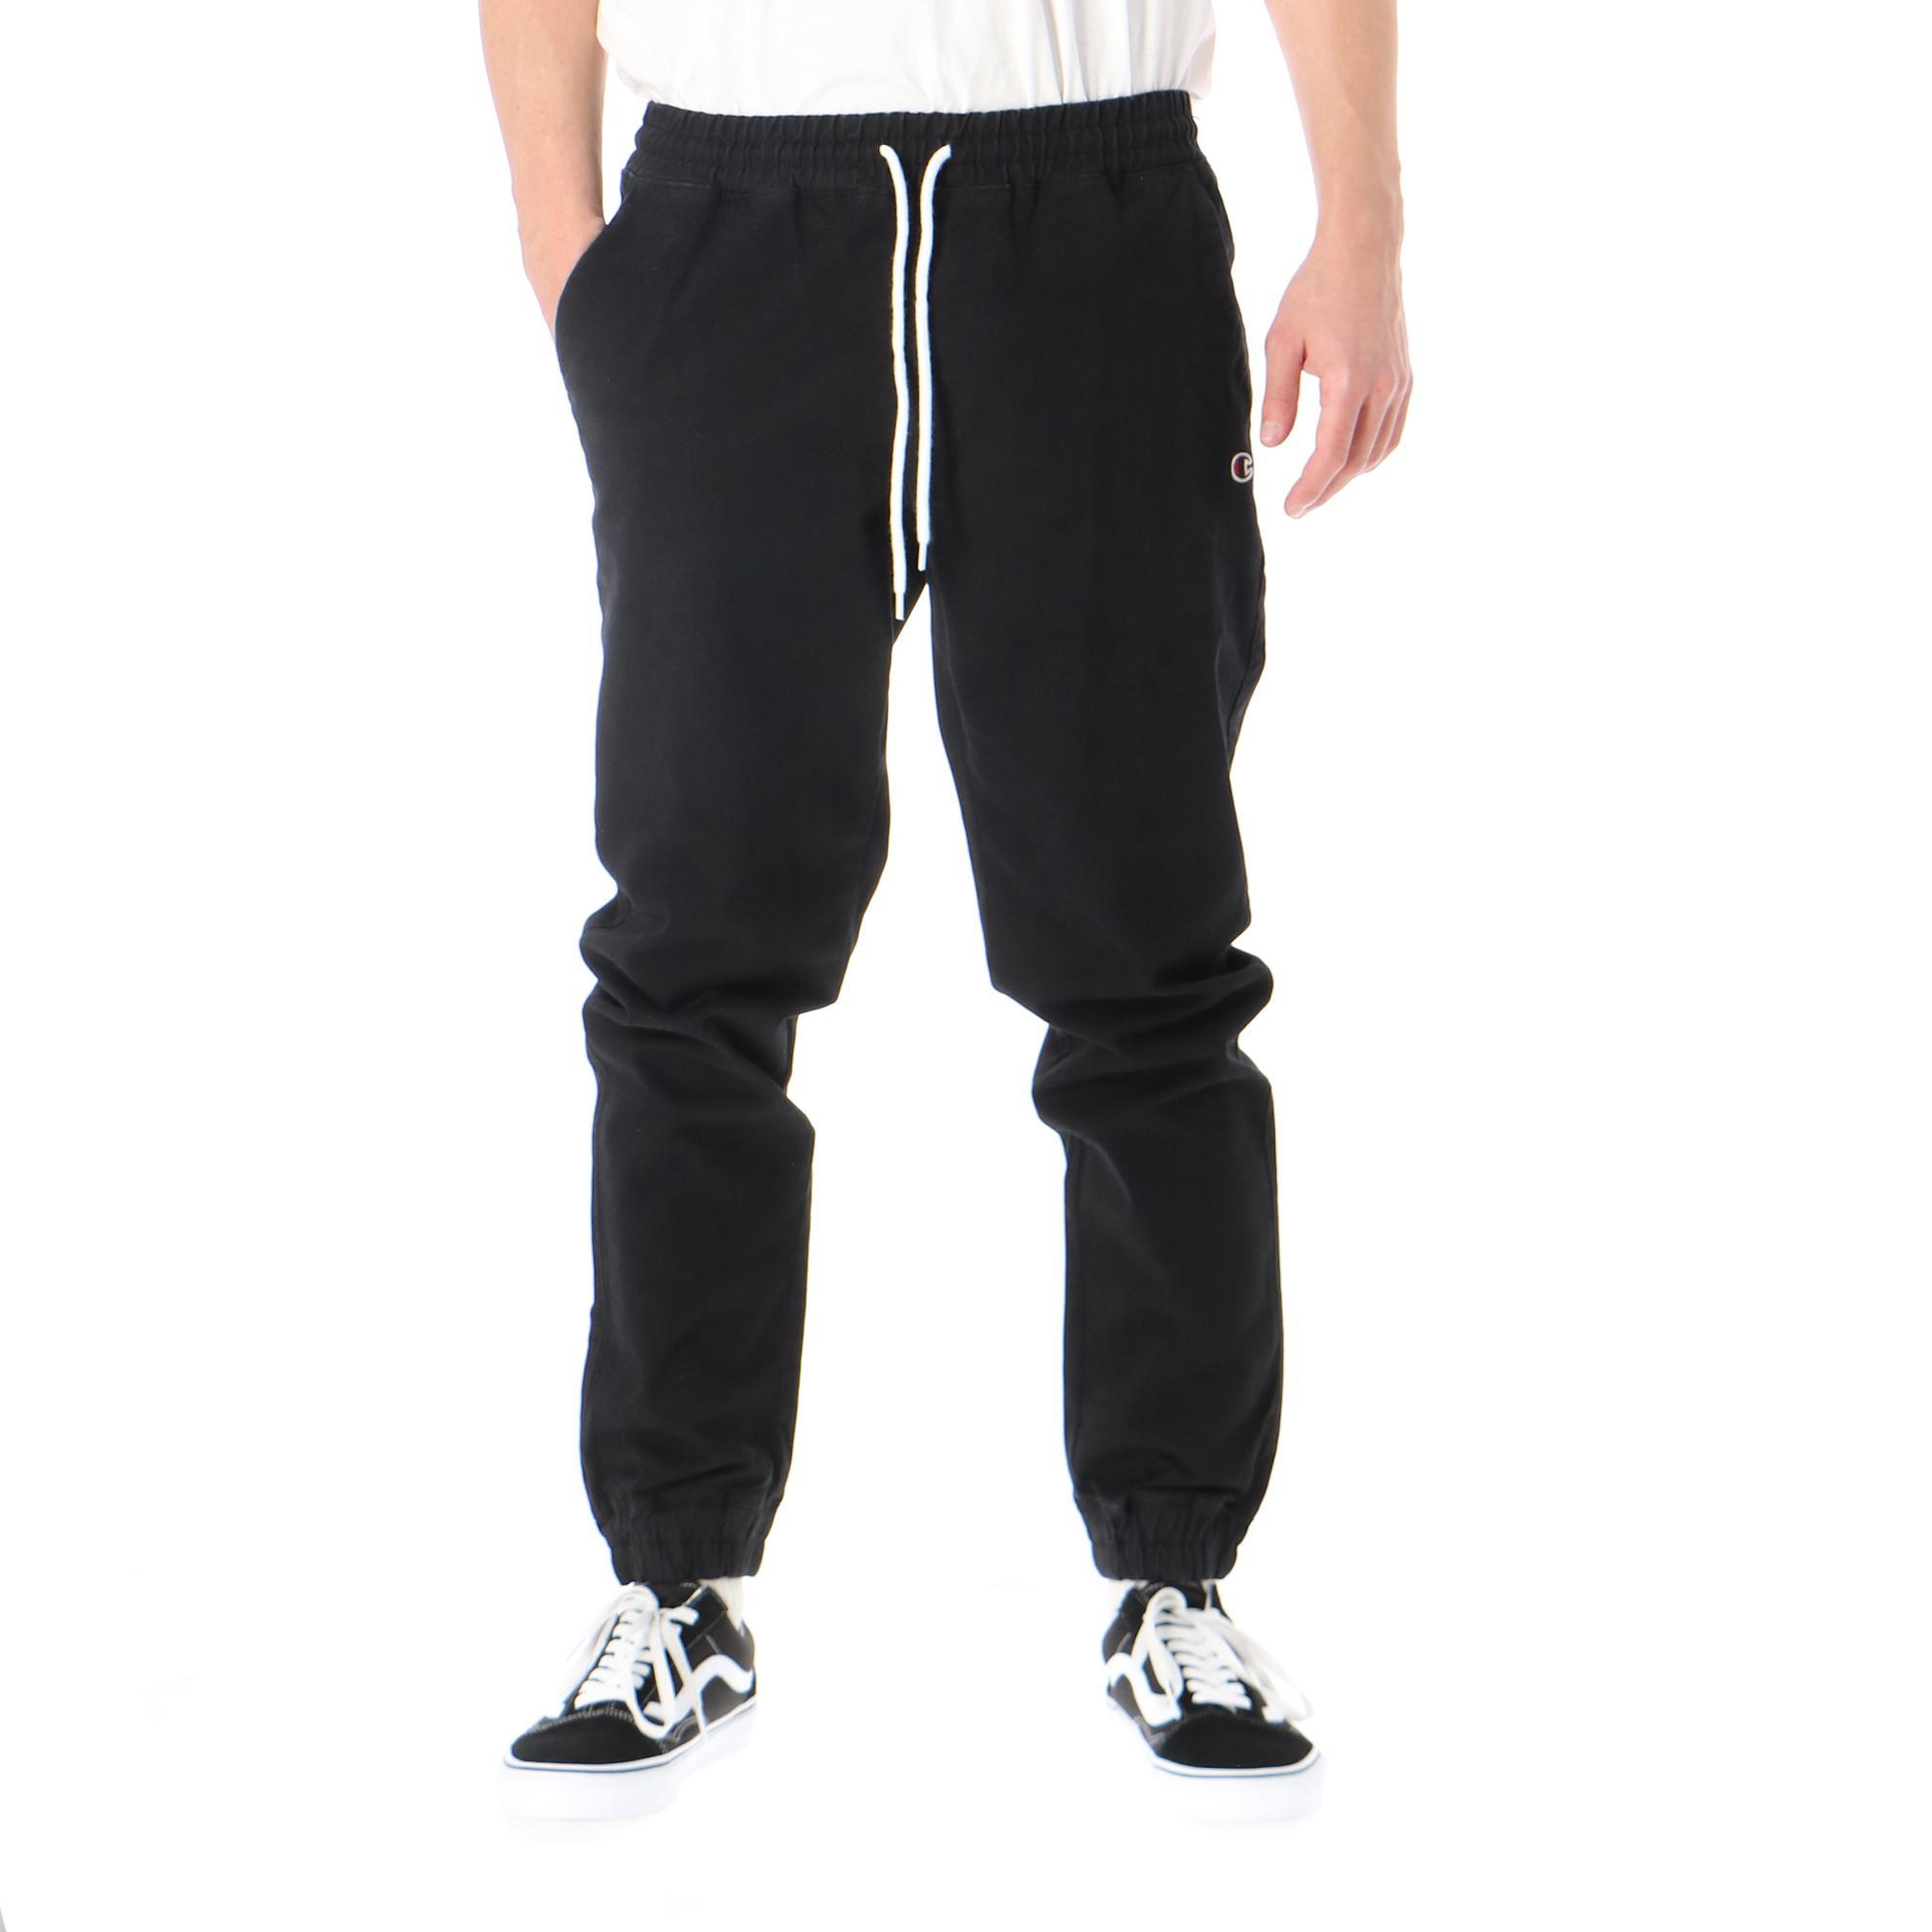 Champion Elastic Cuff Pants Black